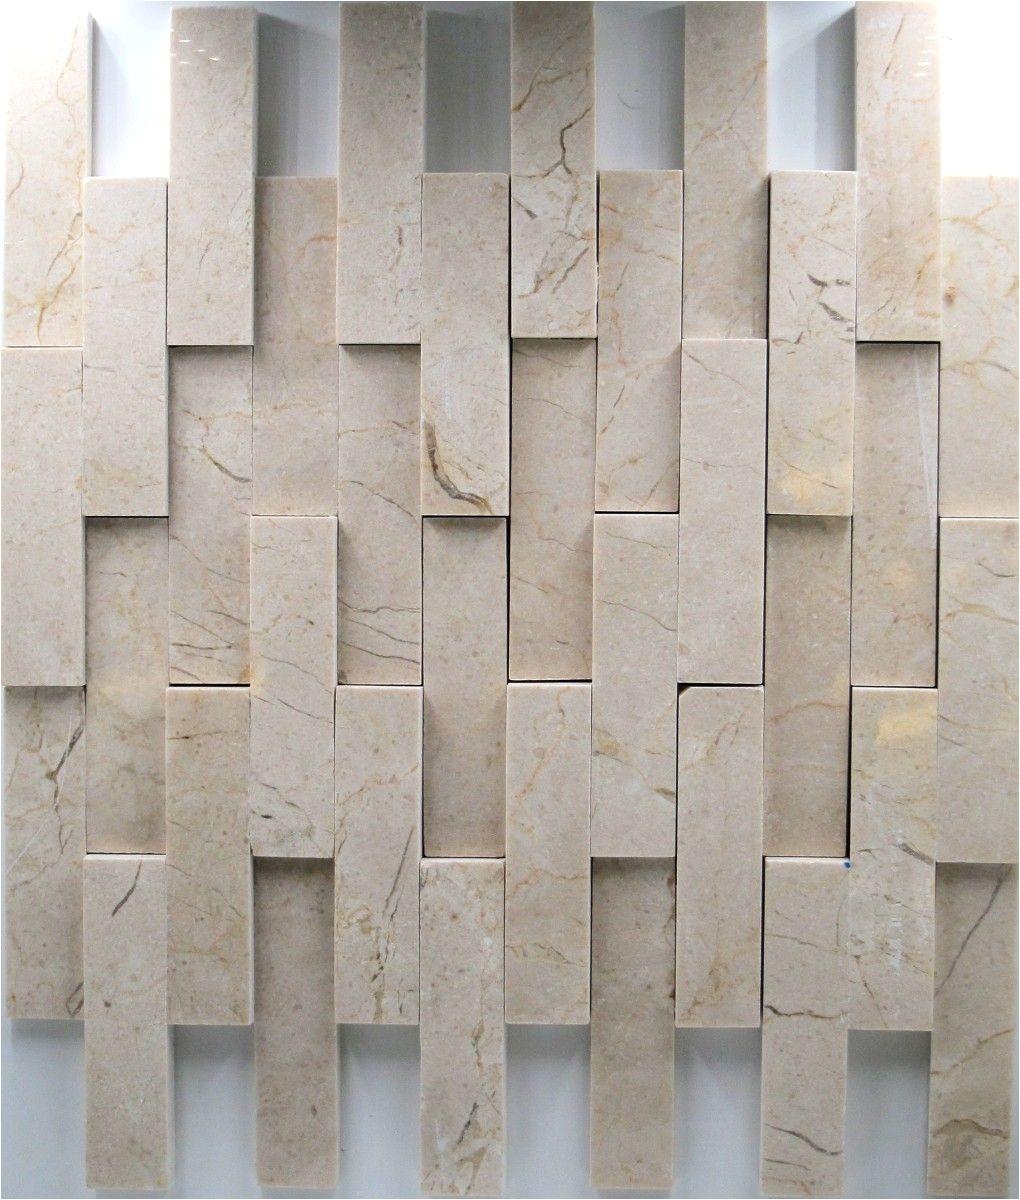 elevations crema marfil marble polish tiles kitchen bathroom flooring quartz